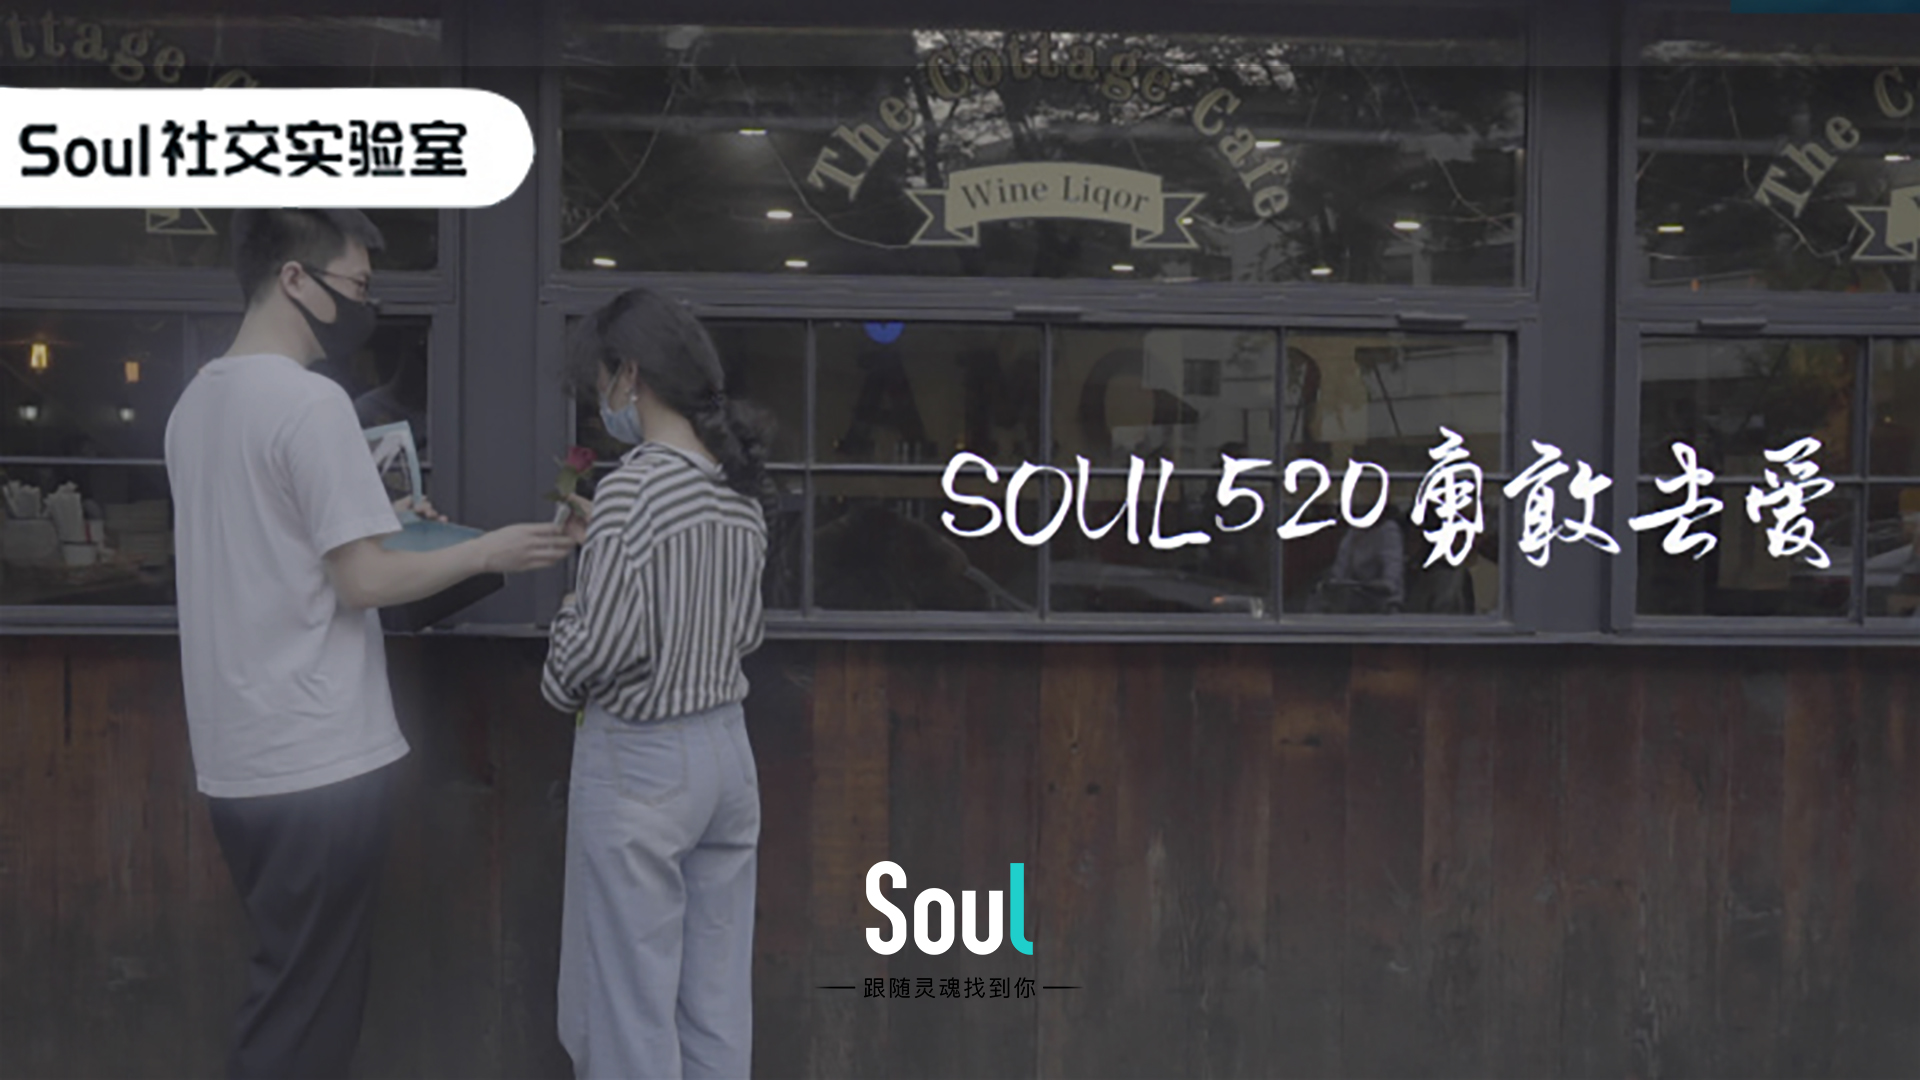 Soul 520社会实验:用1000朵玫瑰花点燃上海的浪漫情怀